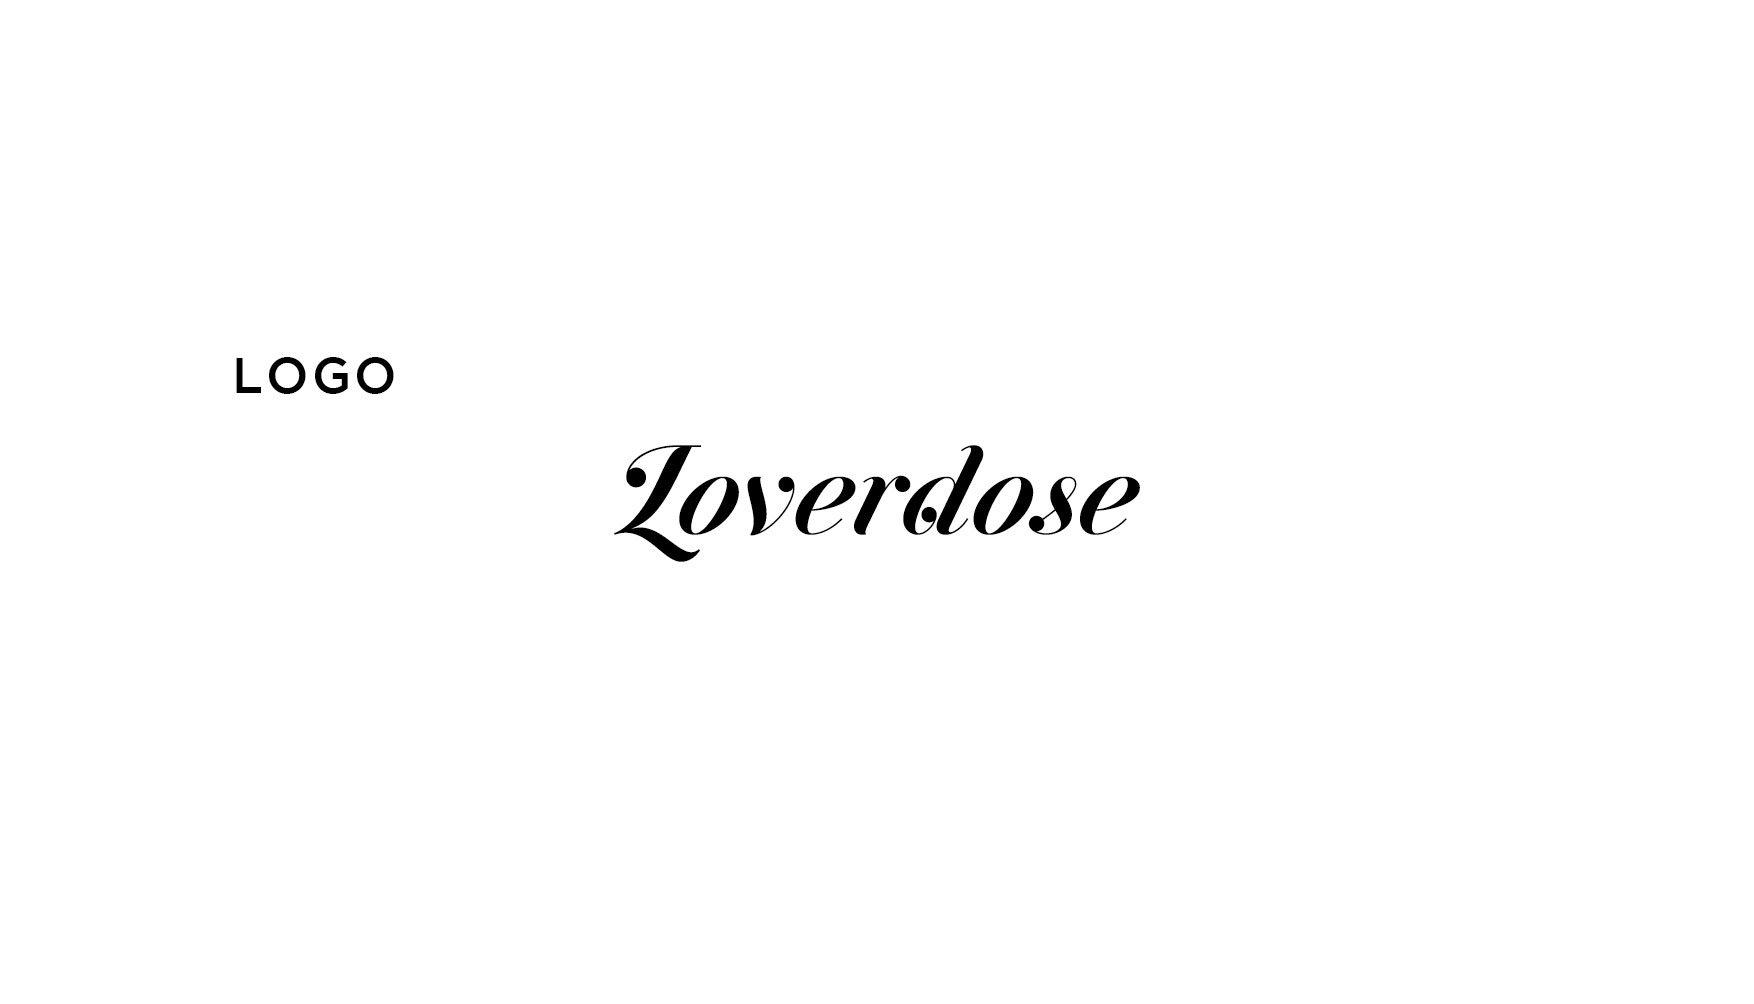 LOVERDOSE